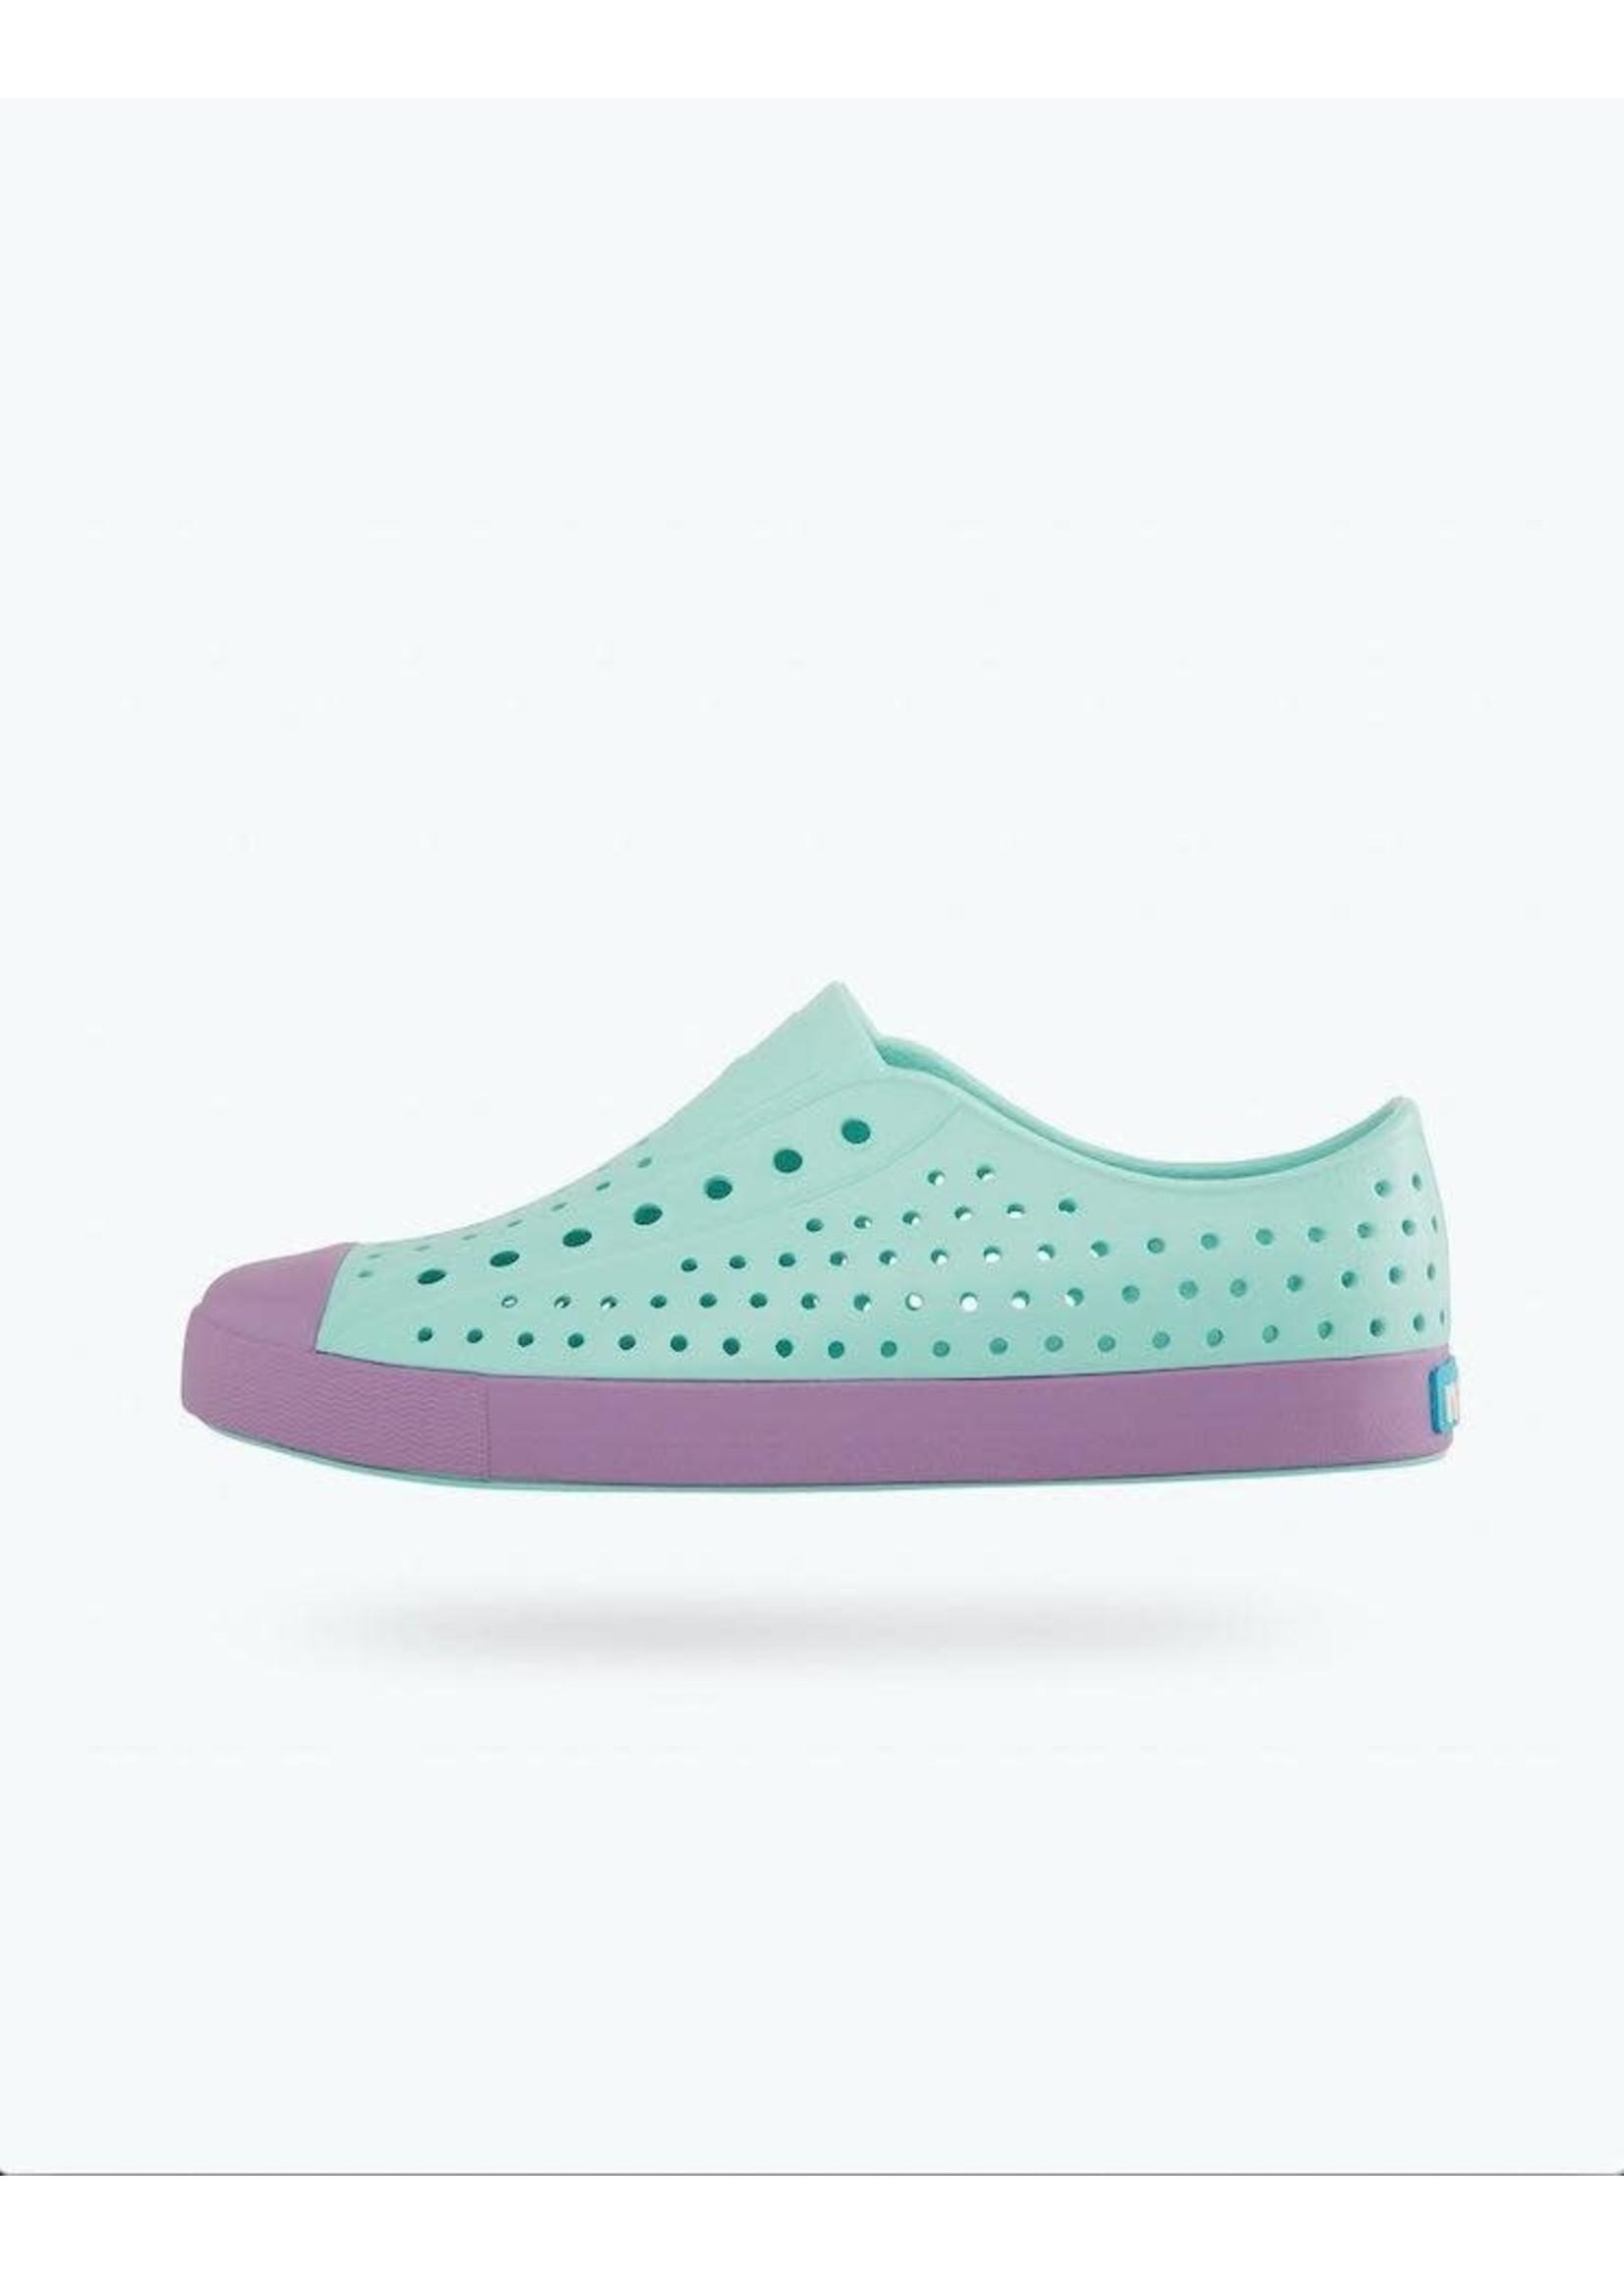 Native Shoes Native Shoes, Jefferson Youth / Junior in Piedmont Blue/ Sea Fan Purple